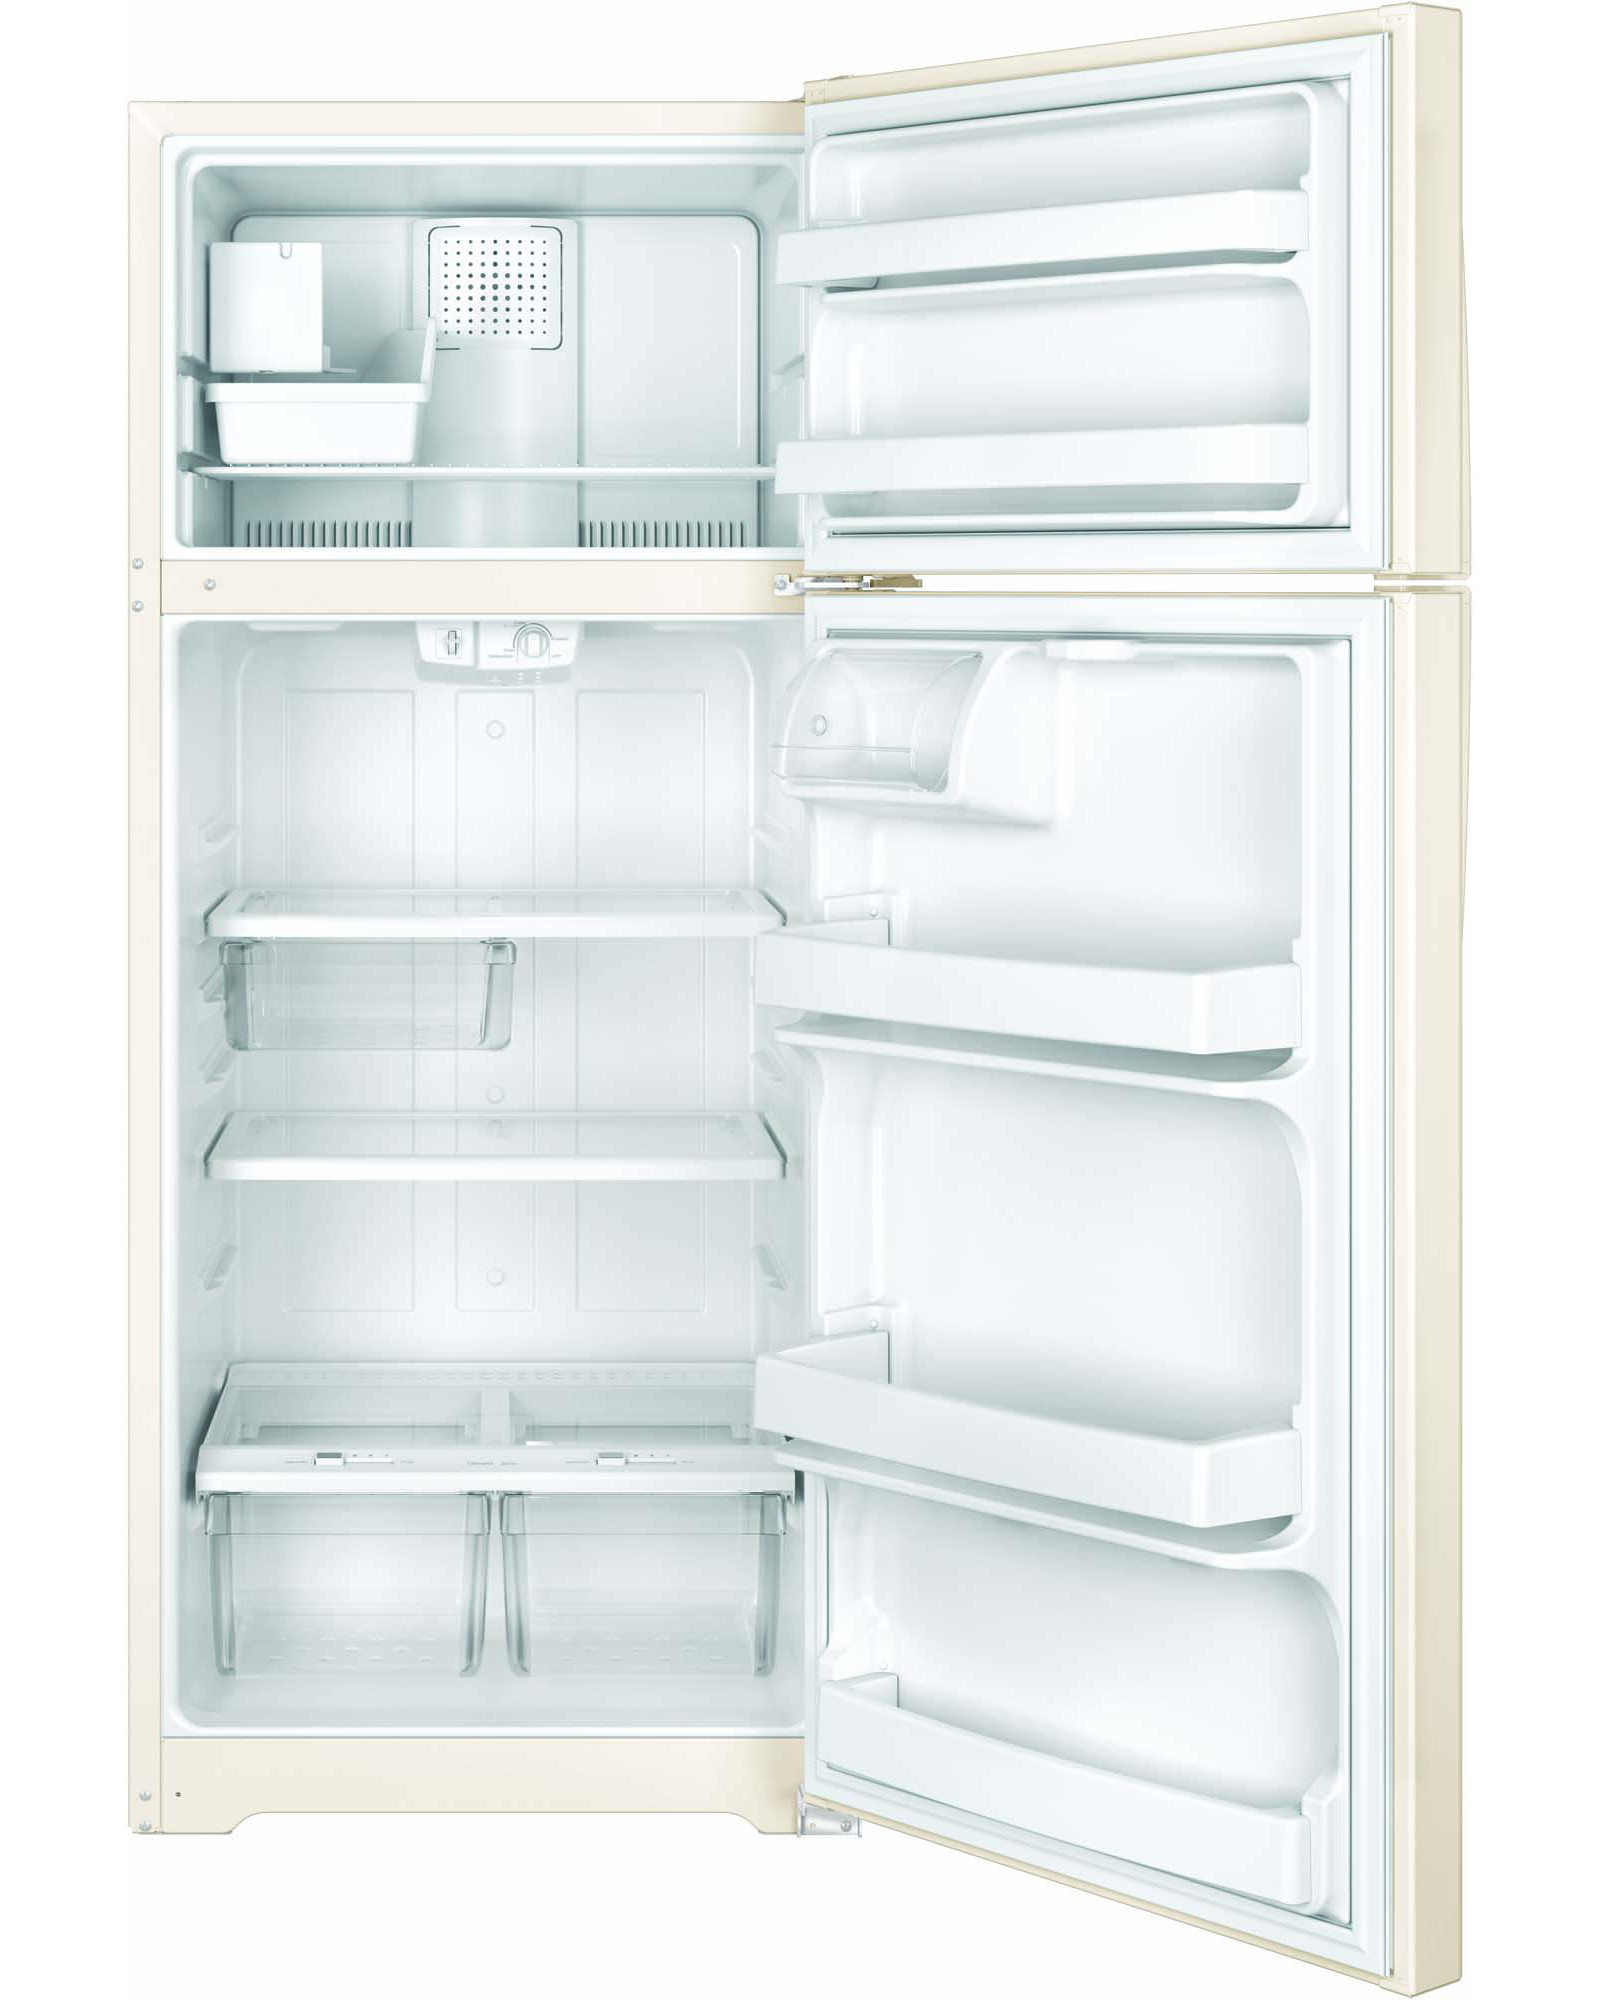 GE Appliances GIE18GTHCC 17.5 cu. ft. Top-Freezer Refrigerator - Beige & Bisque